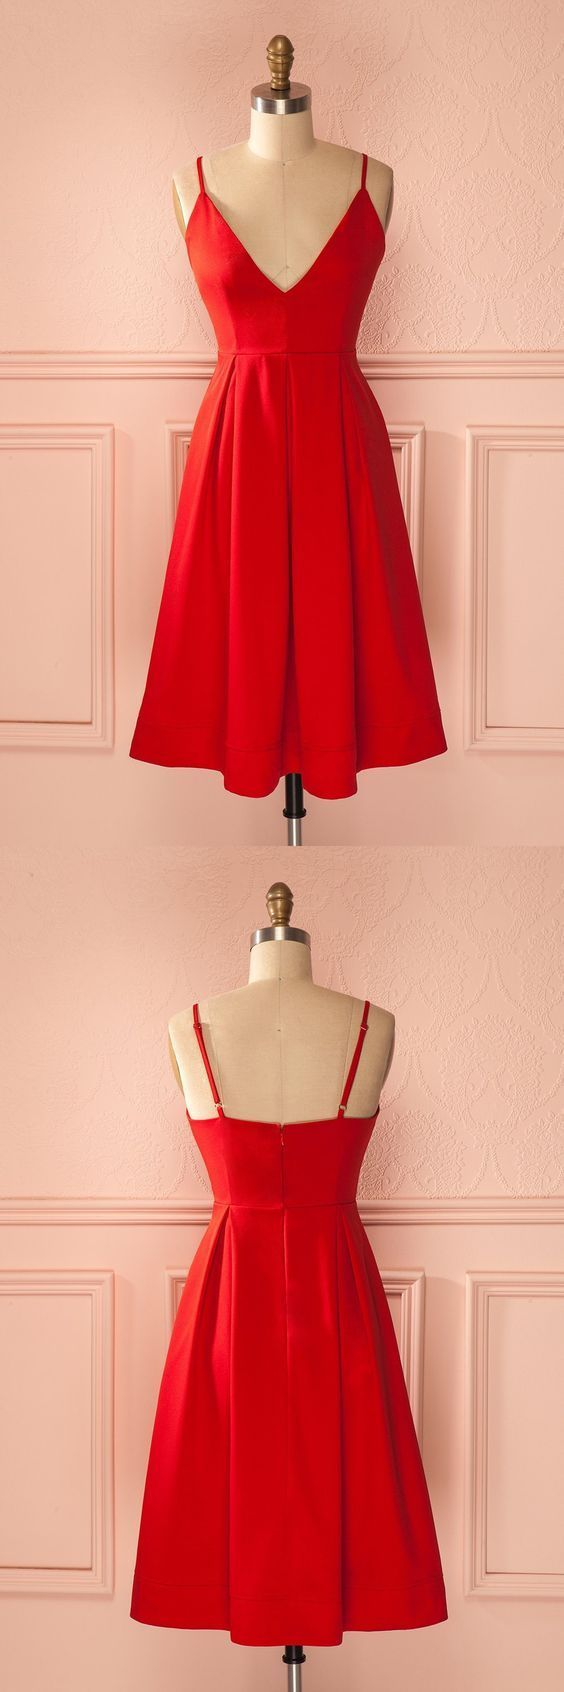 Short red homecoming dress party dress short red dancing dress